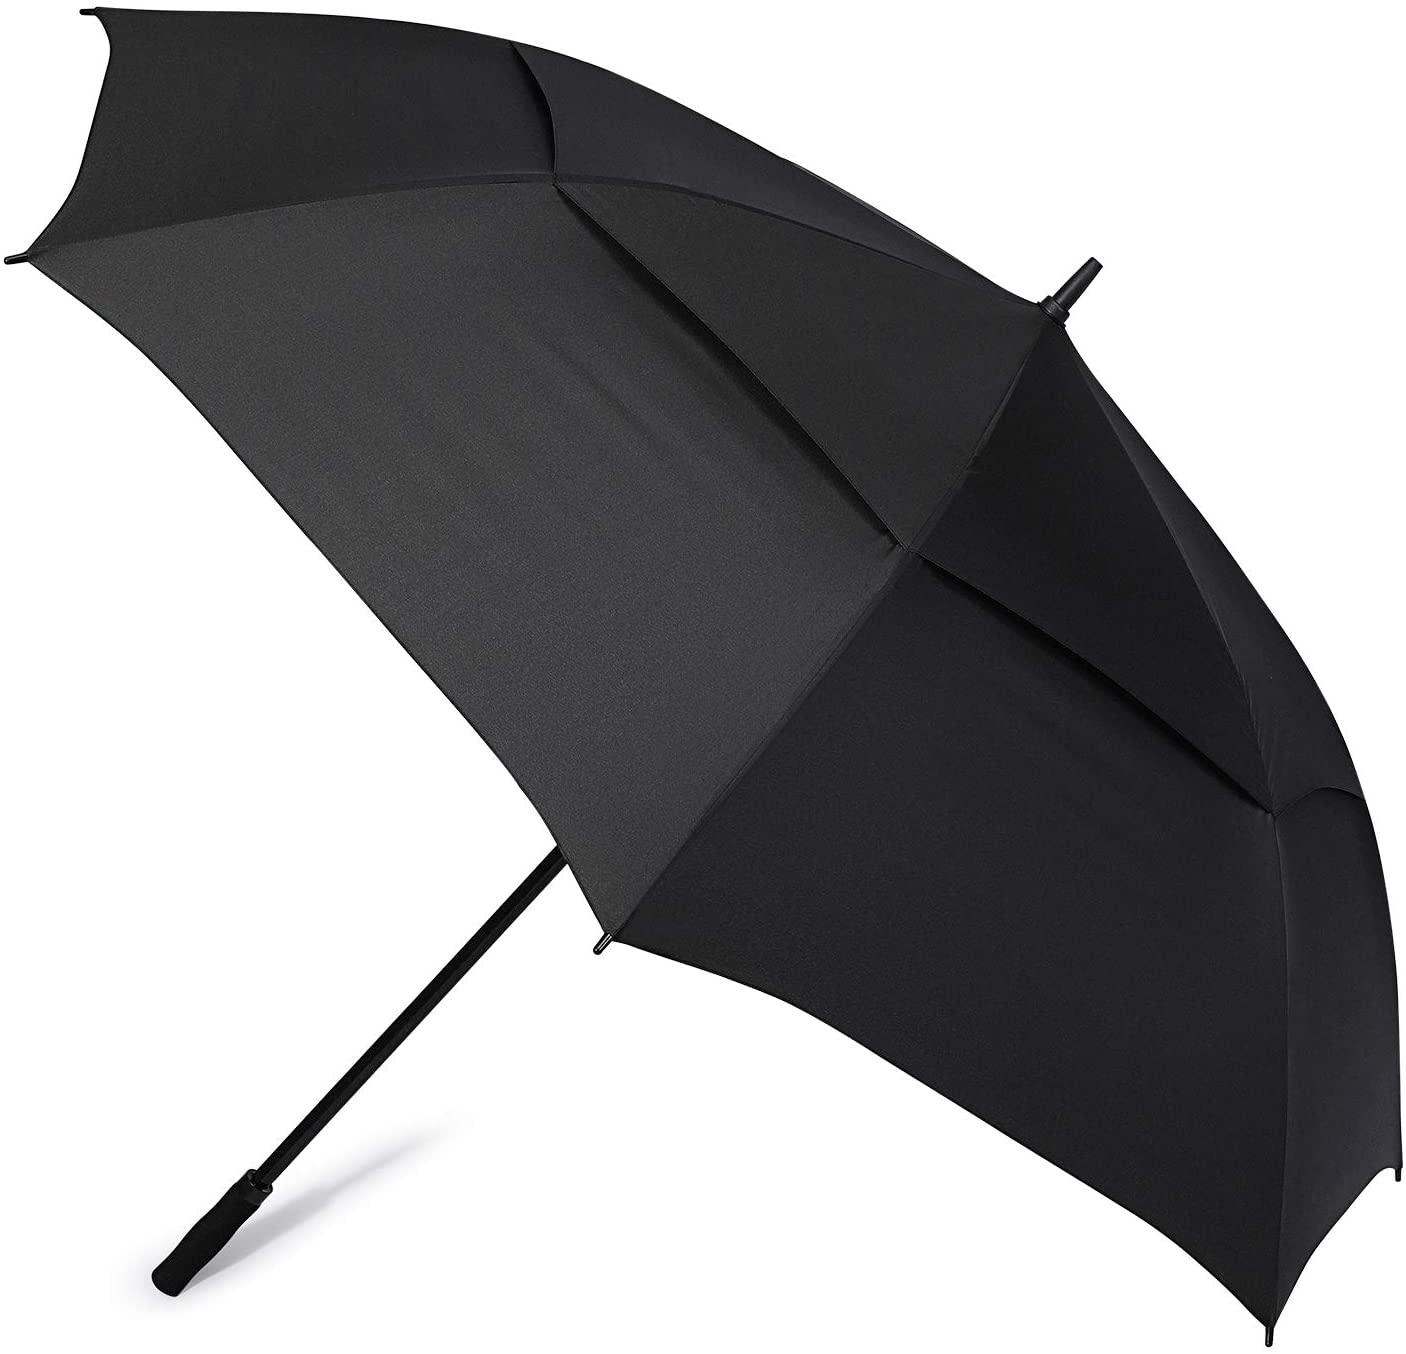 G4Free 72 Inch Huge Large Oversize Golf Umbrella Automatic Open Double Canopy Vented Windproof Stick Umbrellas, 6 Ft Heavy Duty Outdoor Doorman Umbrella Family Umbrella